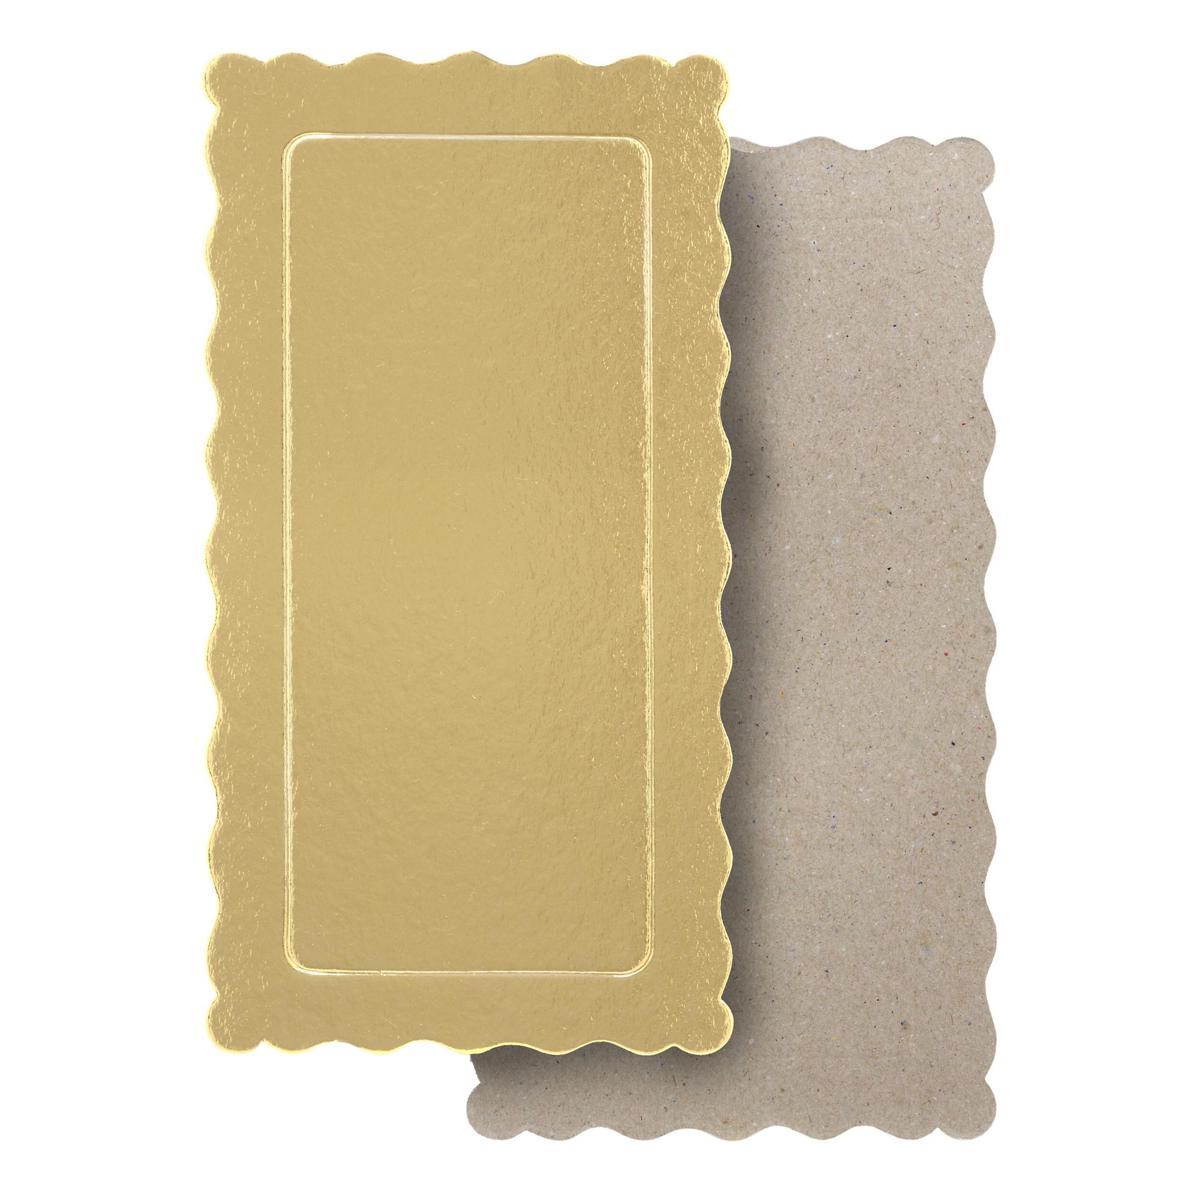 50 Bases Laminadas Para Bolo Retangular, Cake Board 29x15cm